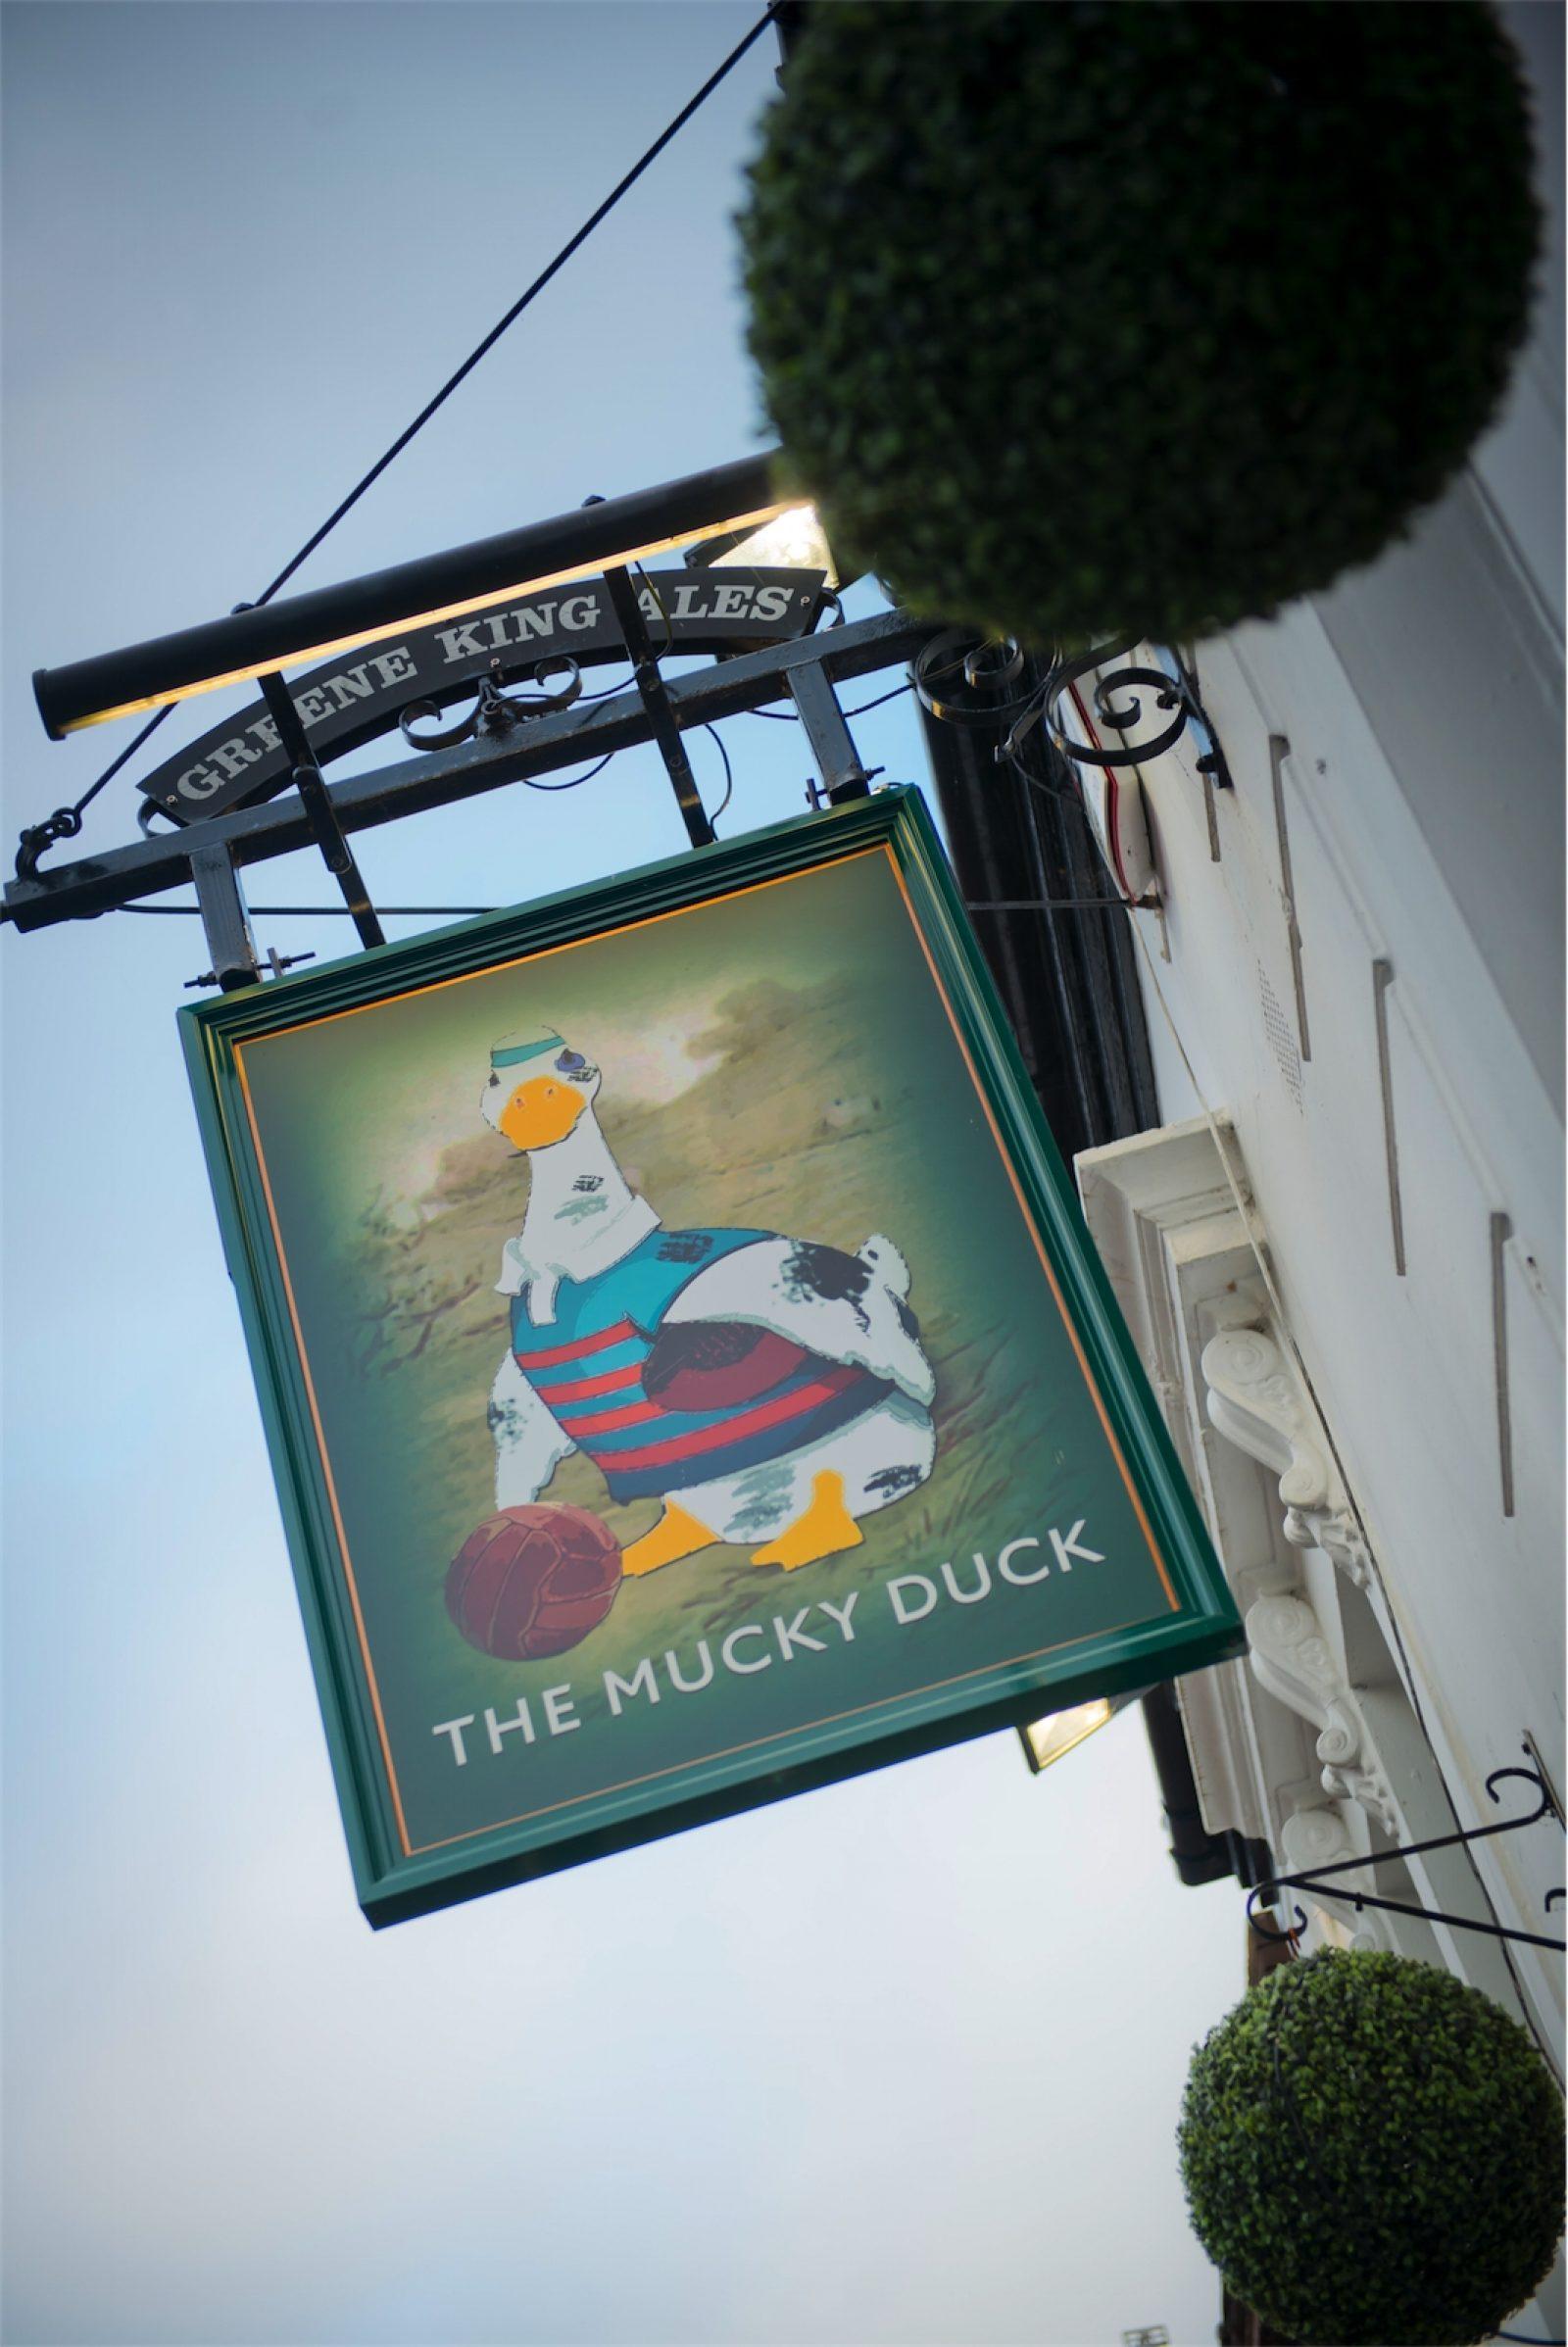 the-mucky-duck-pub-winchester-061